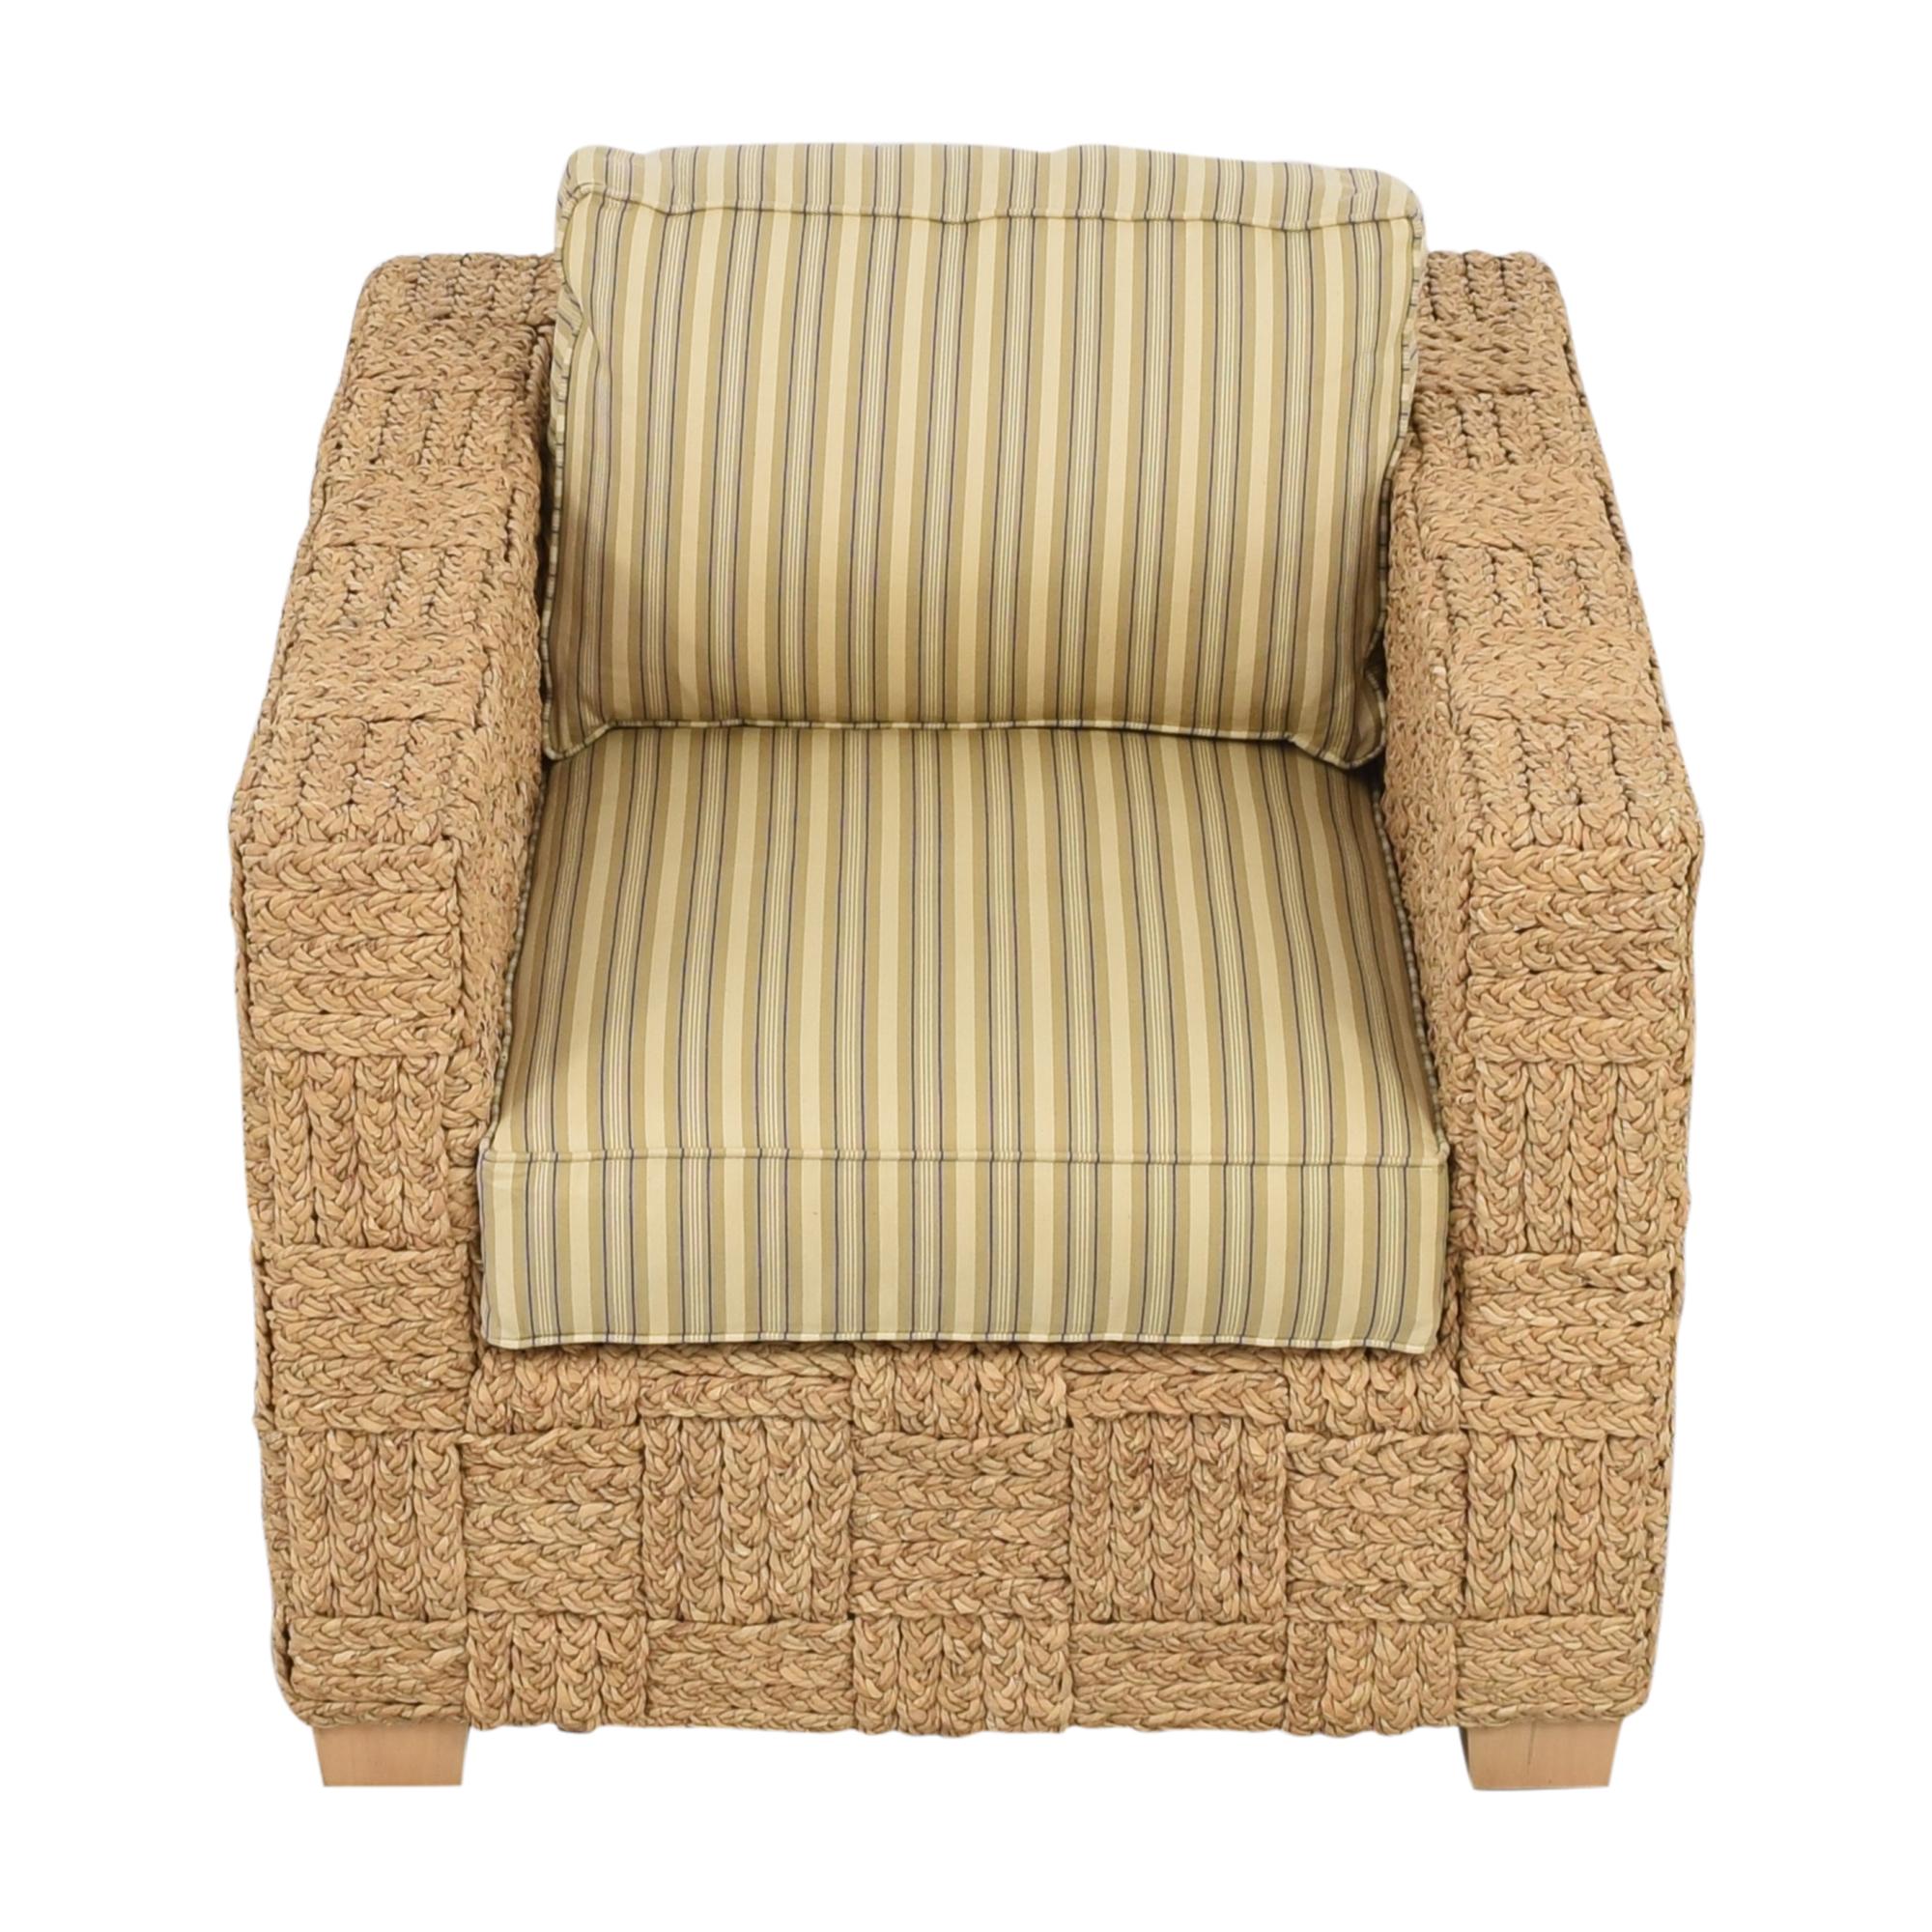 Ralph Lauren Home Ralph Lauren Home Accent Chair with Ottoman Chairs